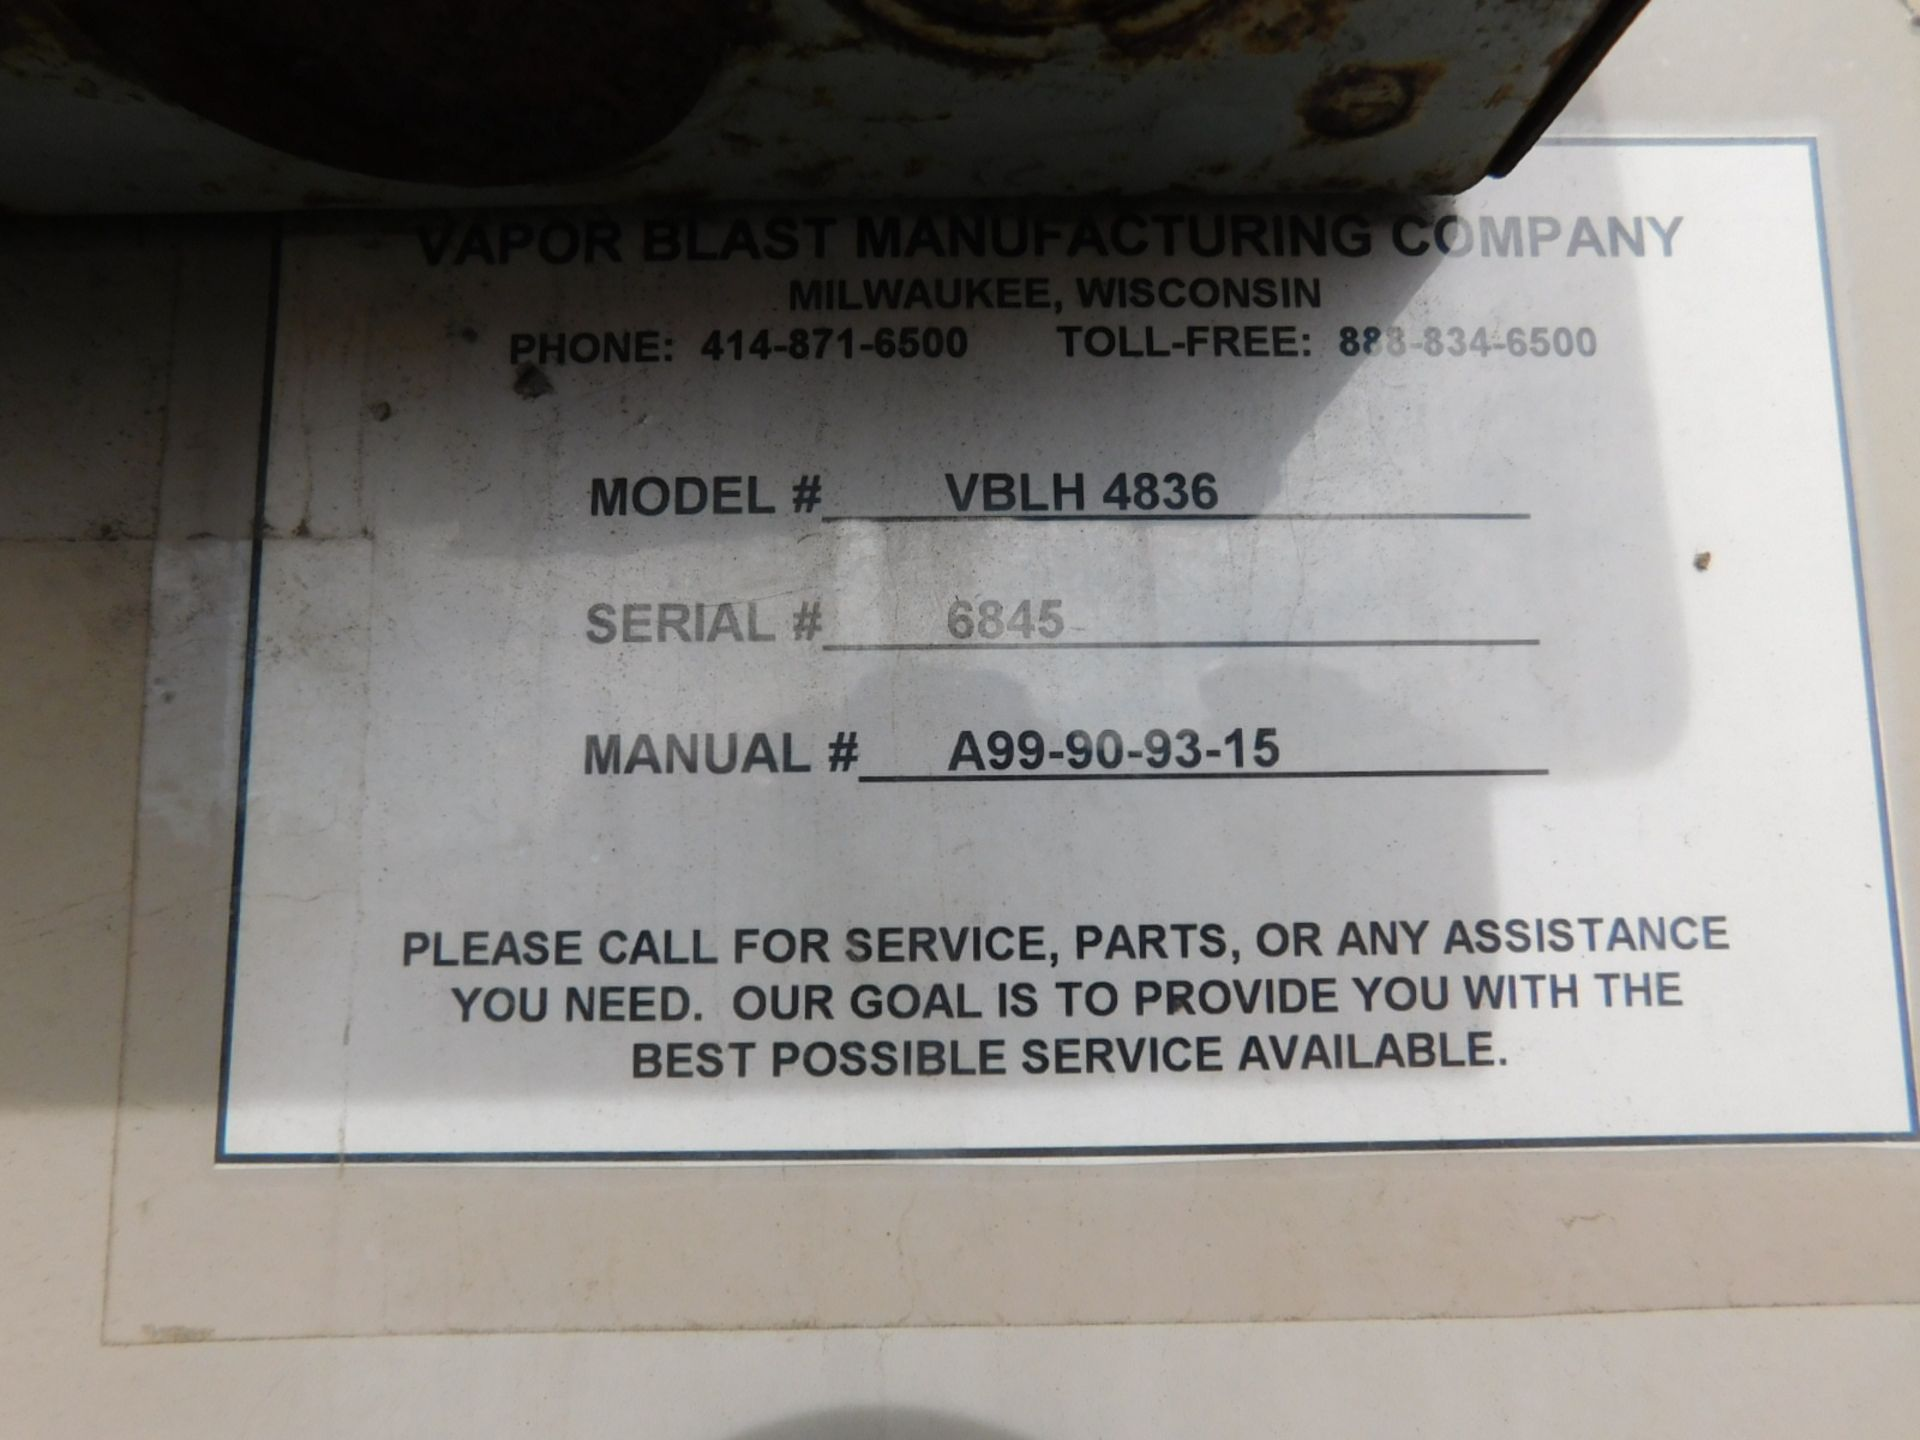 Lot 45 - VAPOR BLAST SANDBLAST CABINET, MODEL VBLH4836, 4' X 3' WORK AREA, S/N 6845